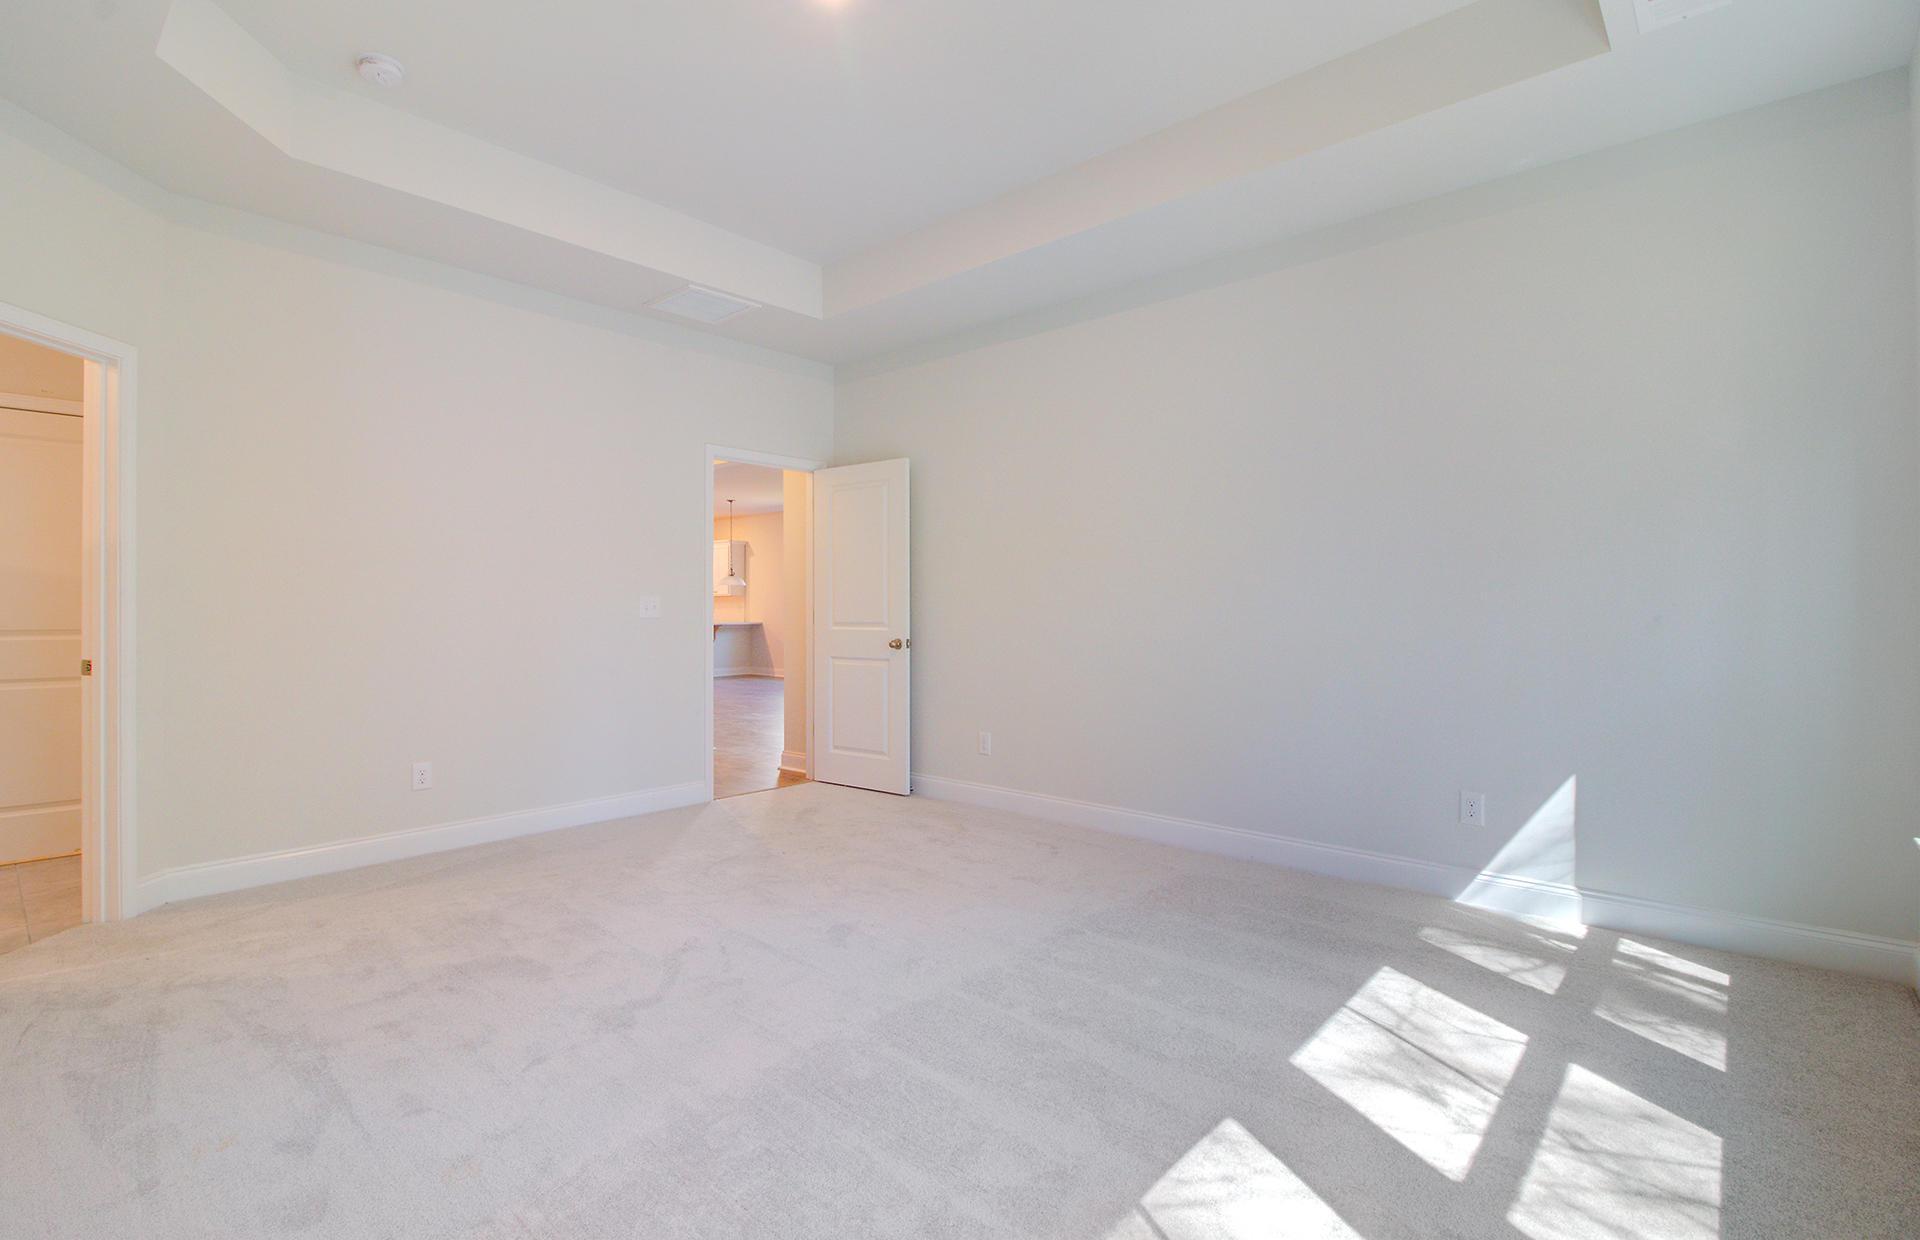 Park West Homes For Sale - 3030 Rice Field, Mount Pleasant, SC - 16